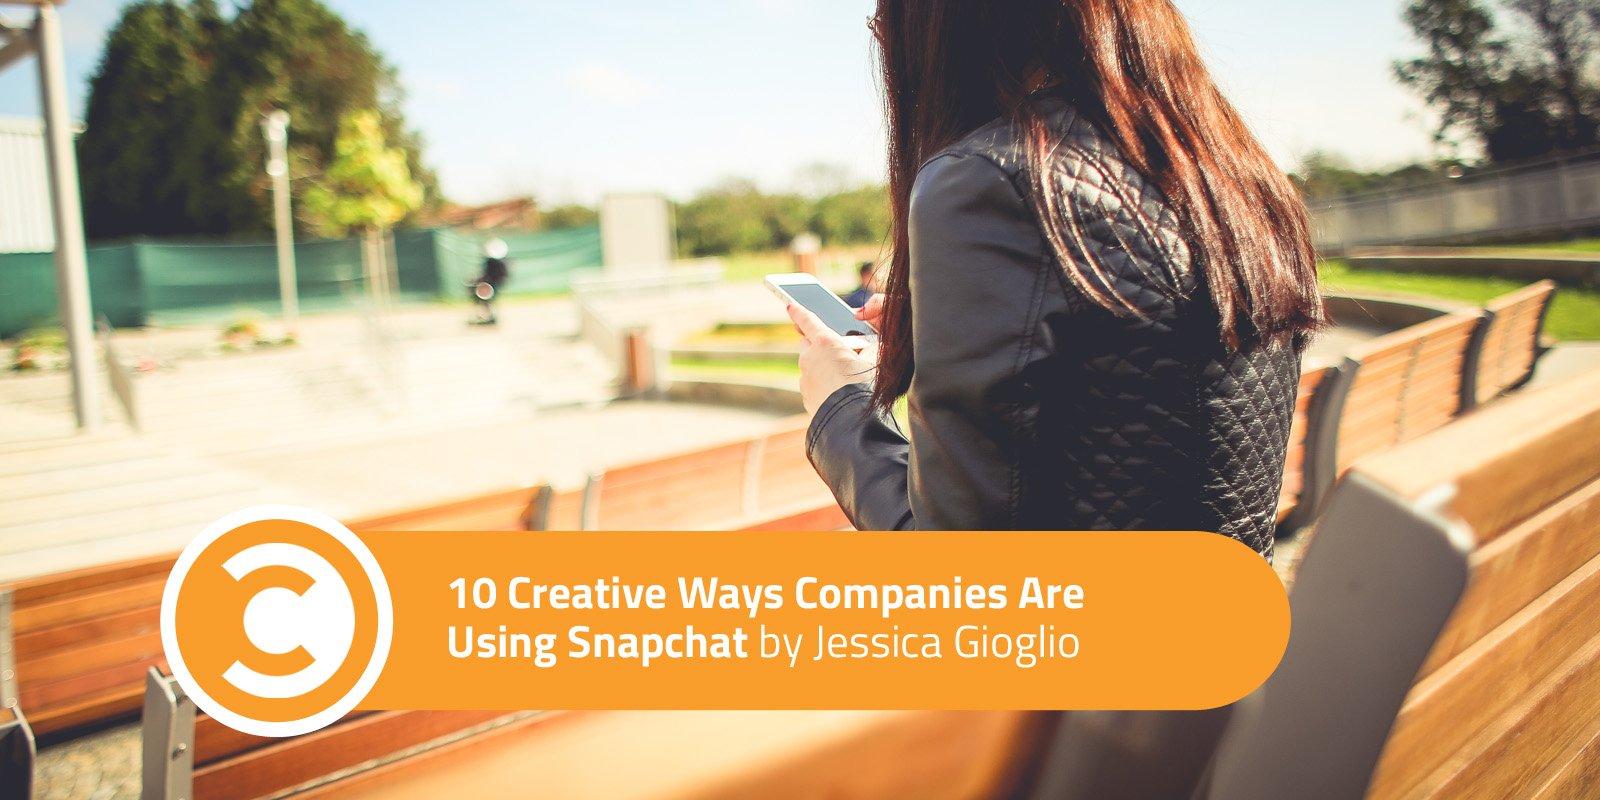 10 Creative Ways Companies Are Using Snapchat